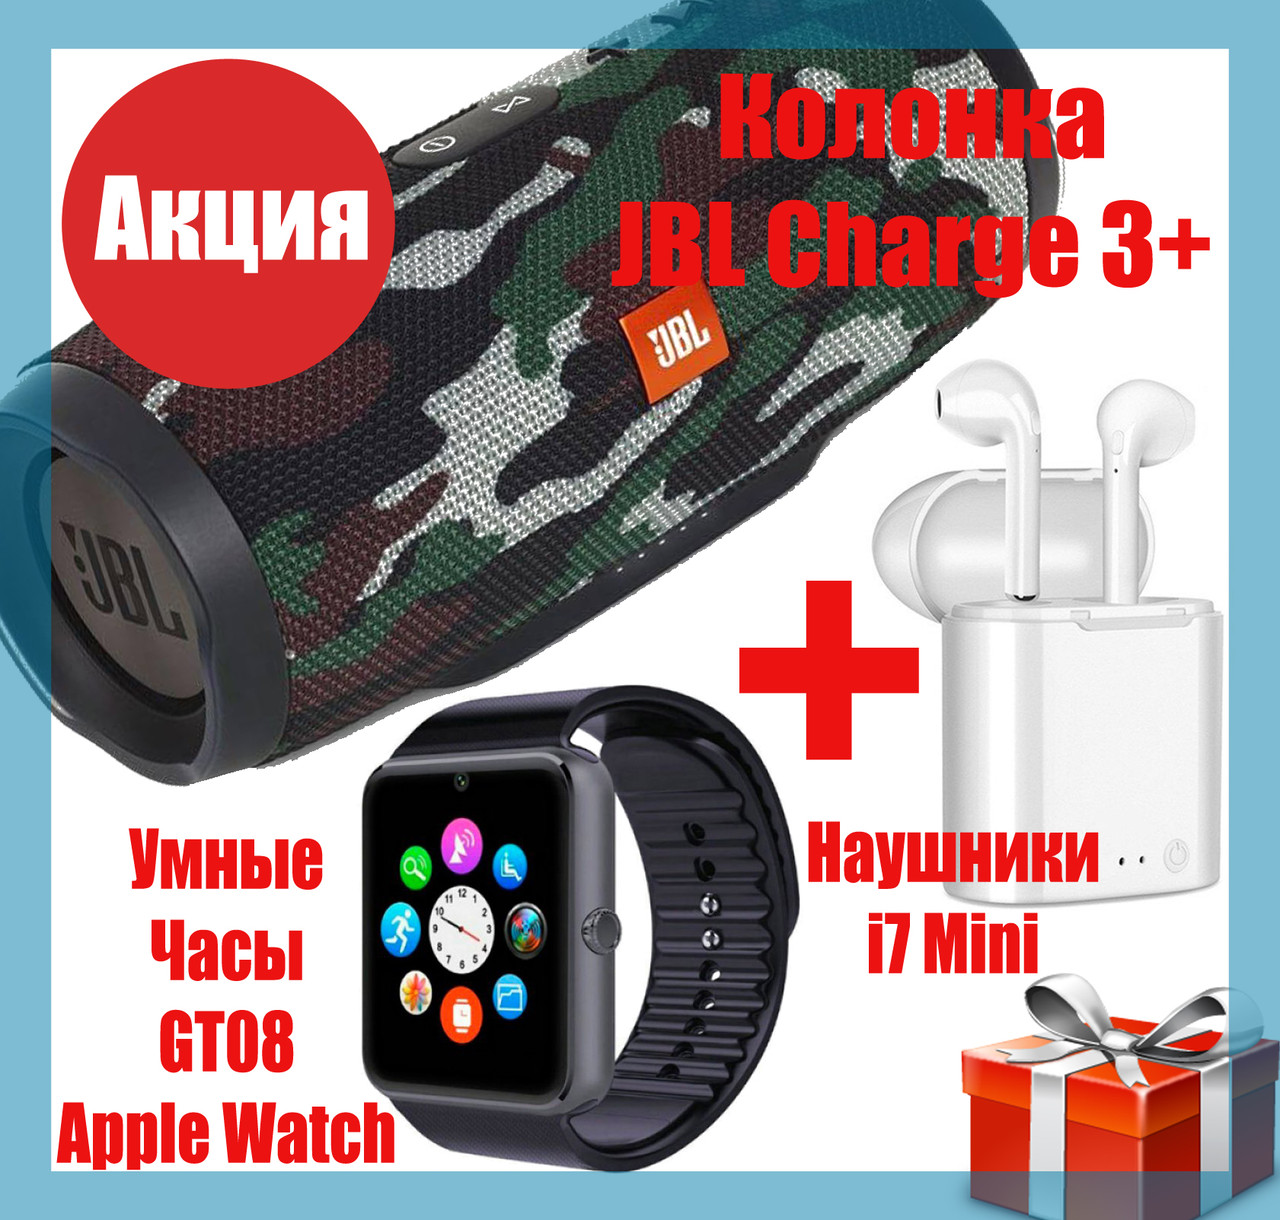 Колонка JBL Charge 3+ Умные часы Apple Watch GT08, наушники блютус i7S Mini Комплект QualitiReplica